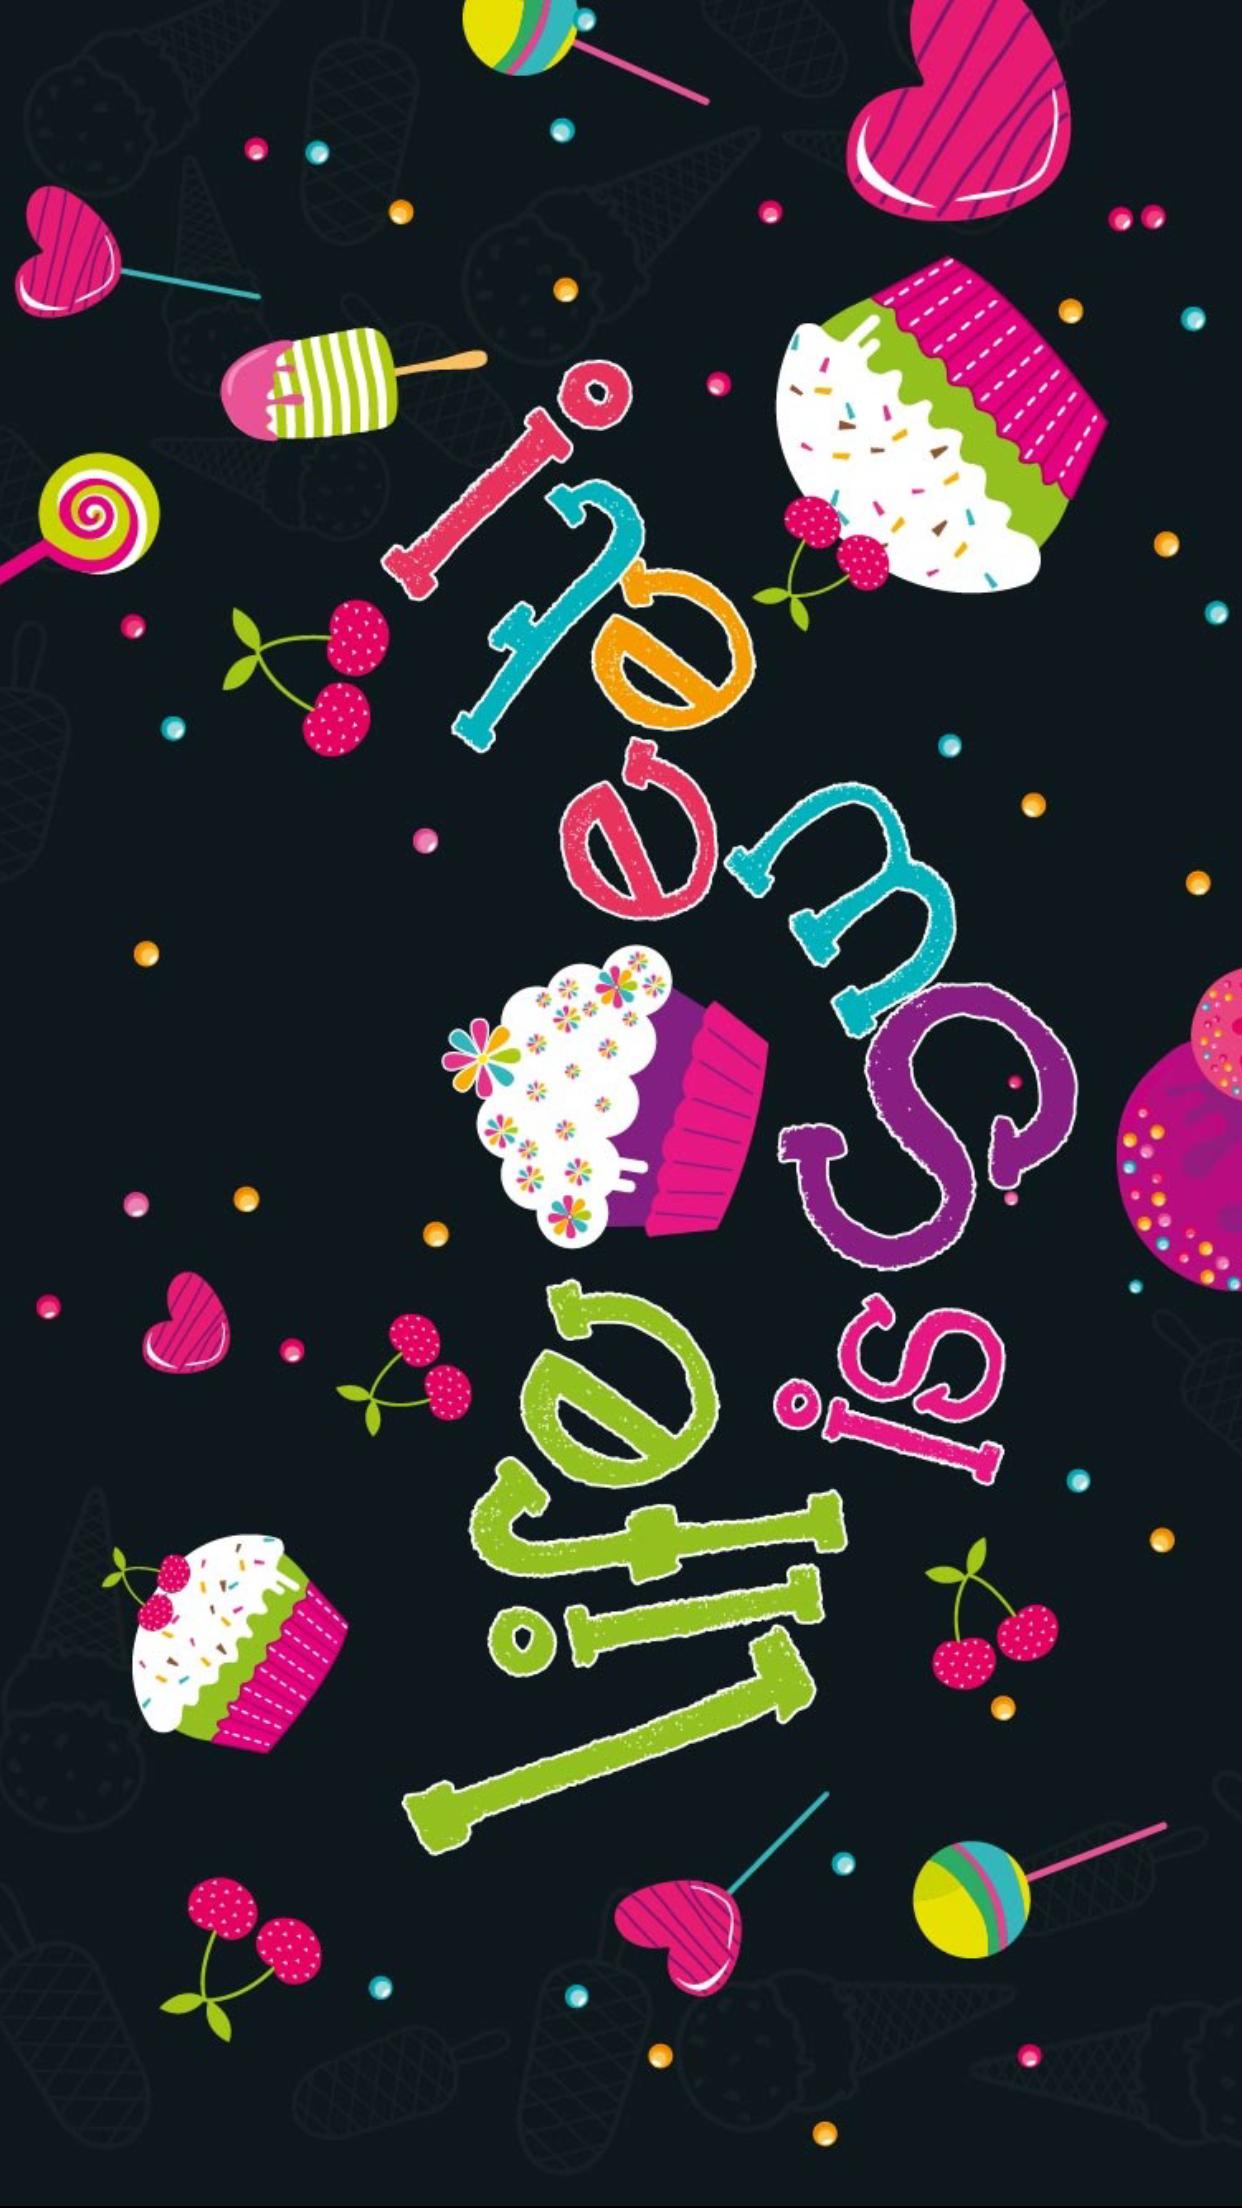 Popular Wallpaper Hello Kitty Vintage - 4dc5bc25f914f91da2d5e27f57a2ace8  Image_80713.png